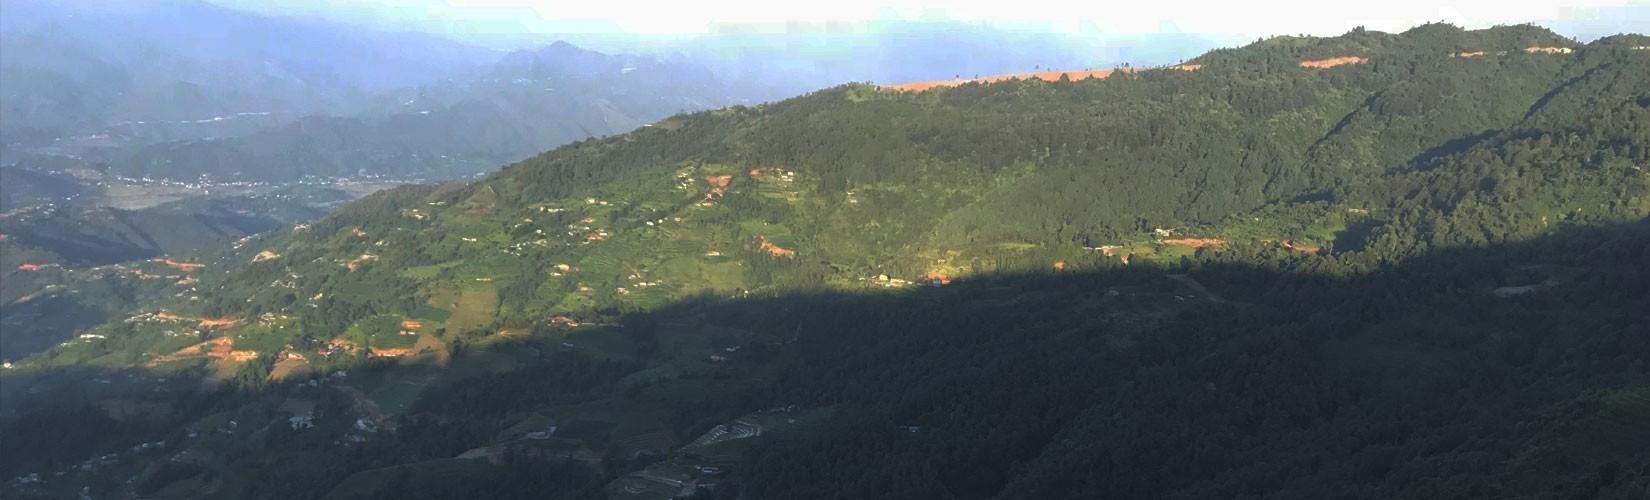 Chisopani Nagarkot Hiking